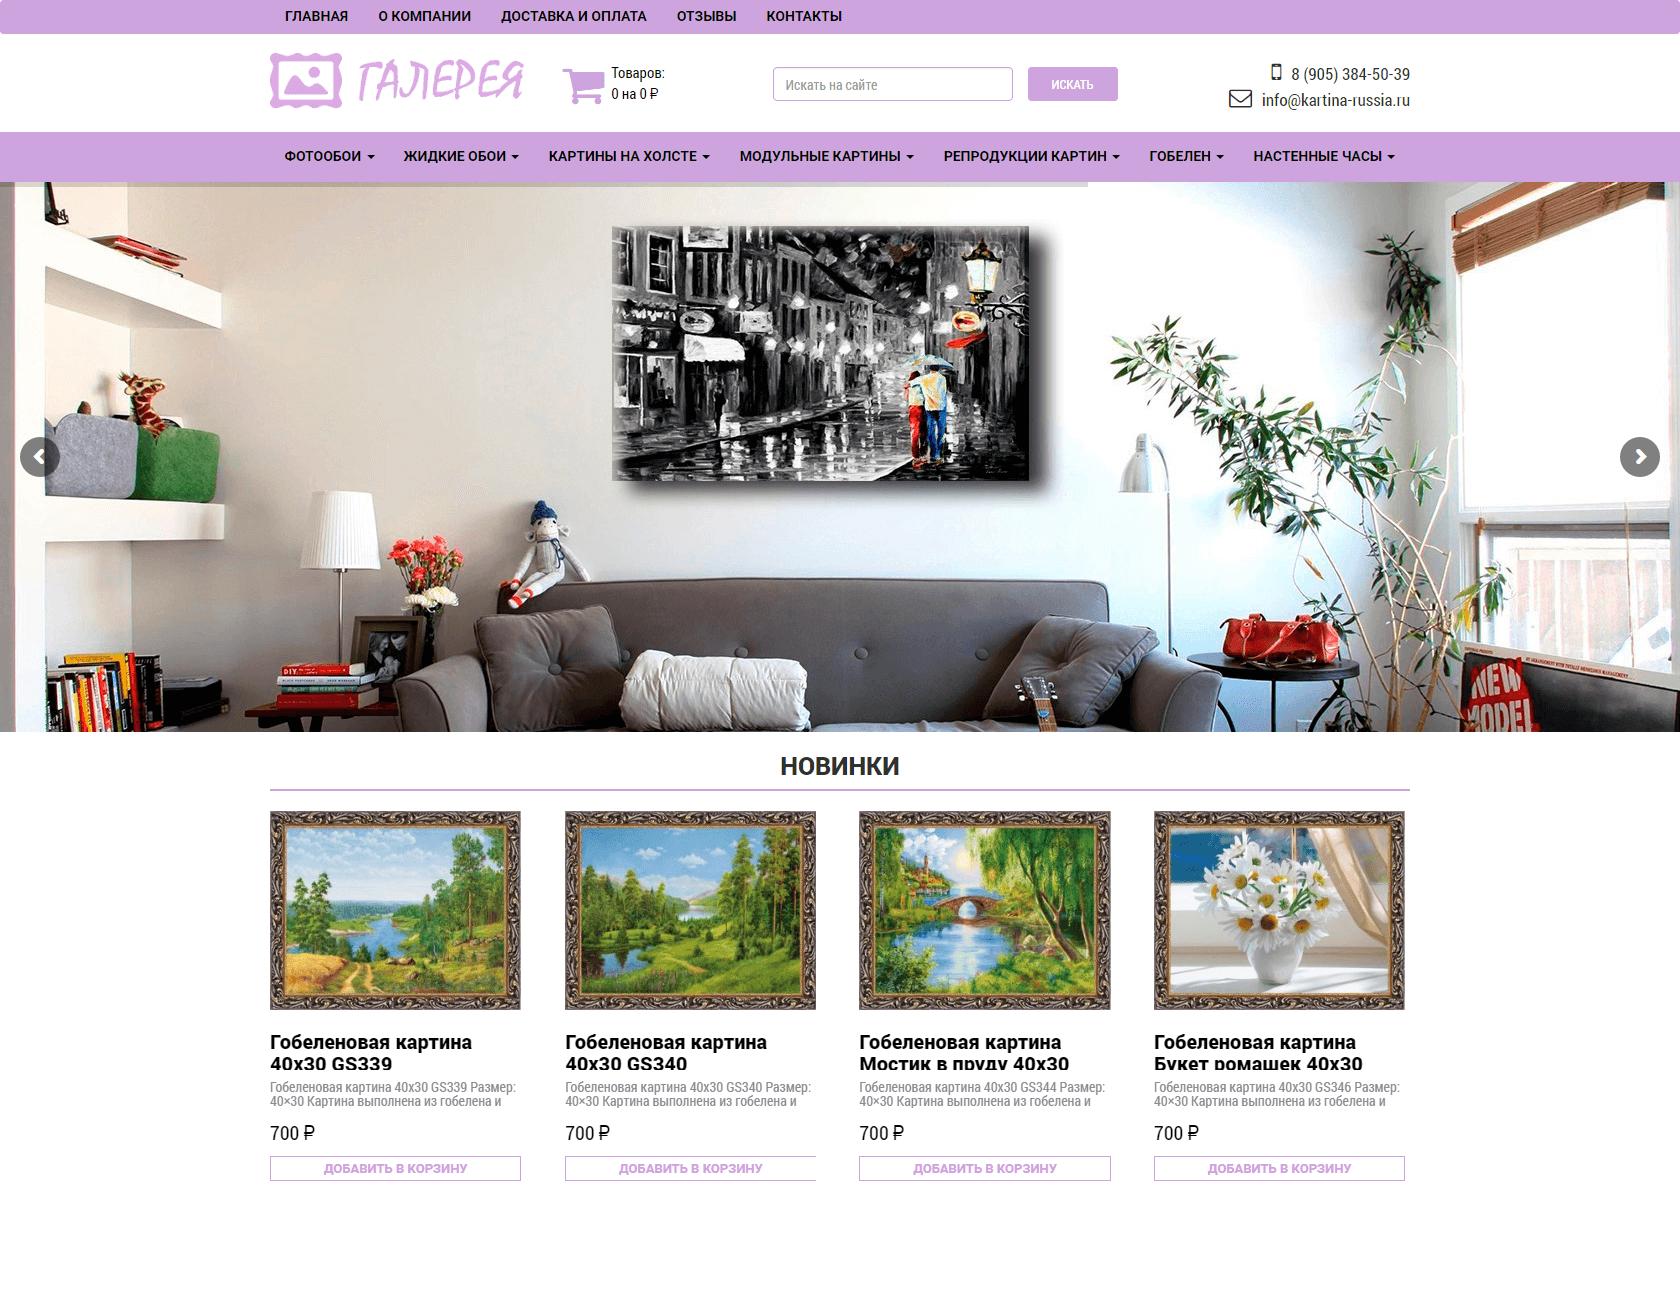 Интернет-магазин Галерея